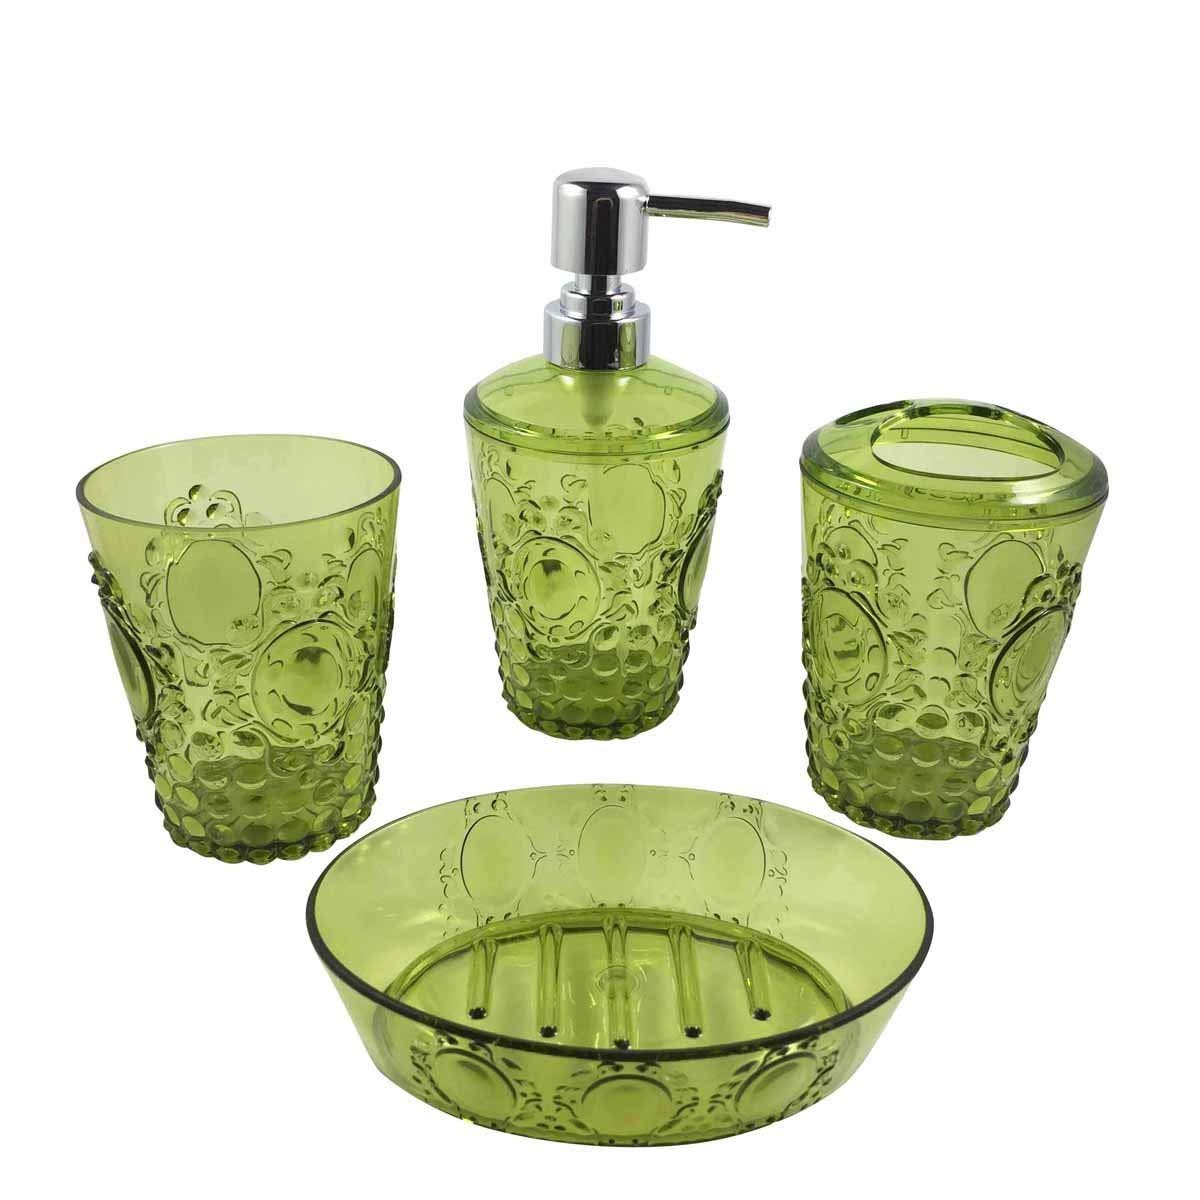 Hampton Acrylic Bathroom Accessories Set of 4 Piece Features Soap Dispenser Pump, Toothbrush Holder, Tumbler, Soap Dish (Green)